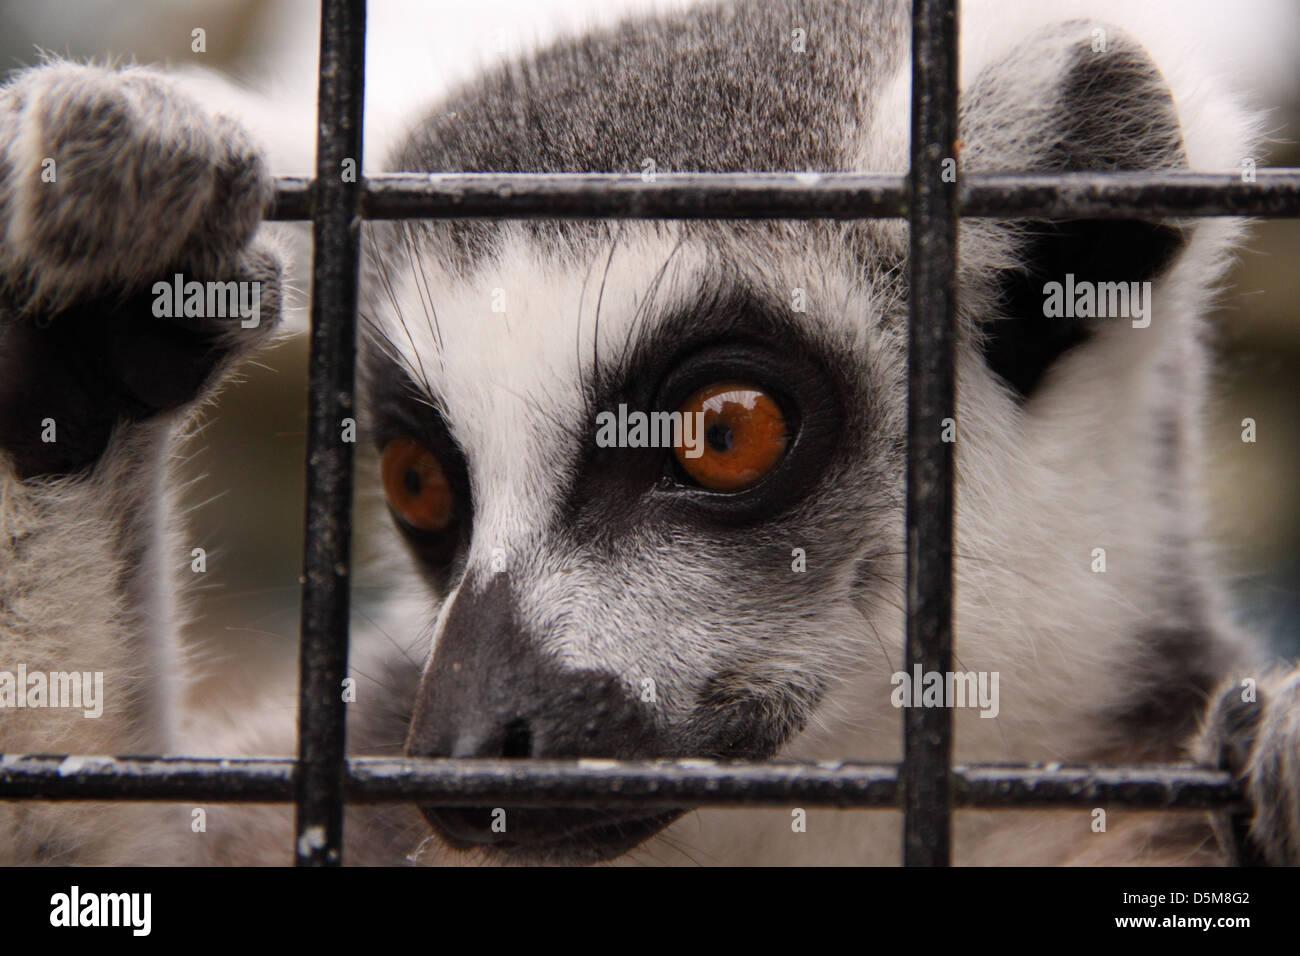 a-ring-tailed-lemur-peers-through-the-ba